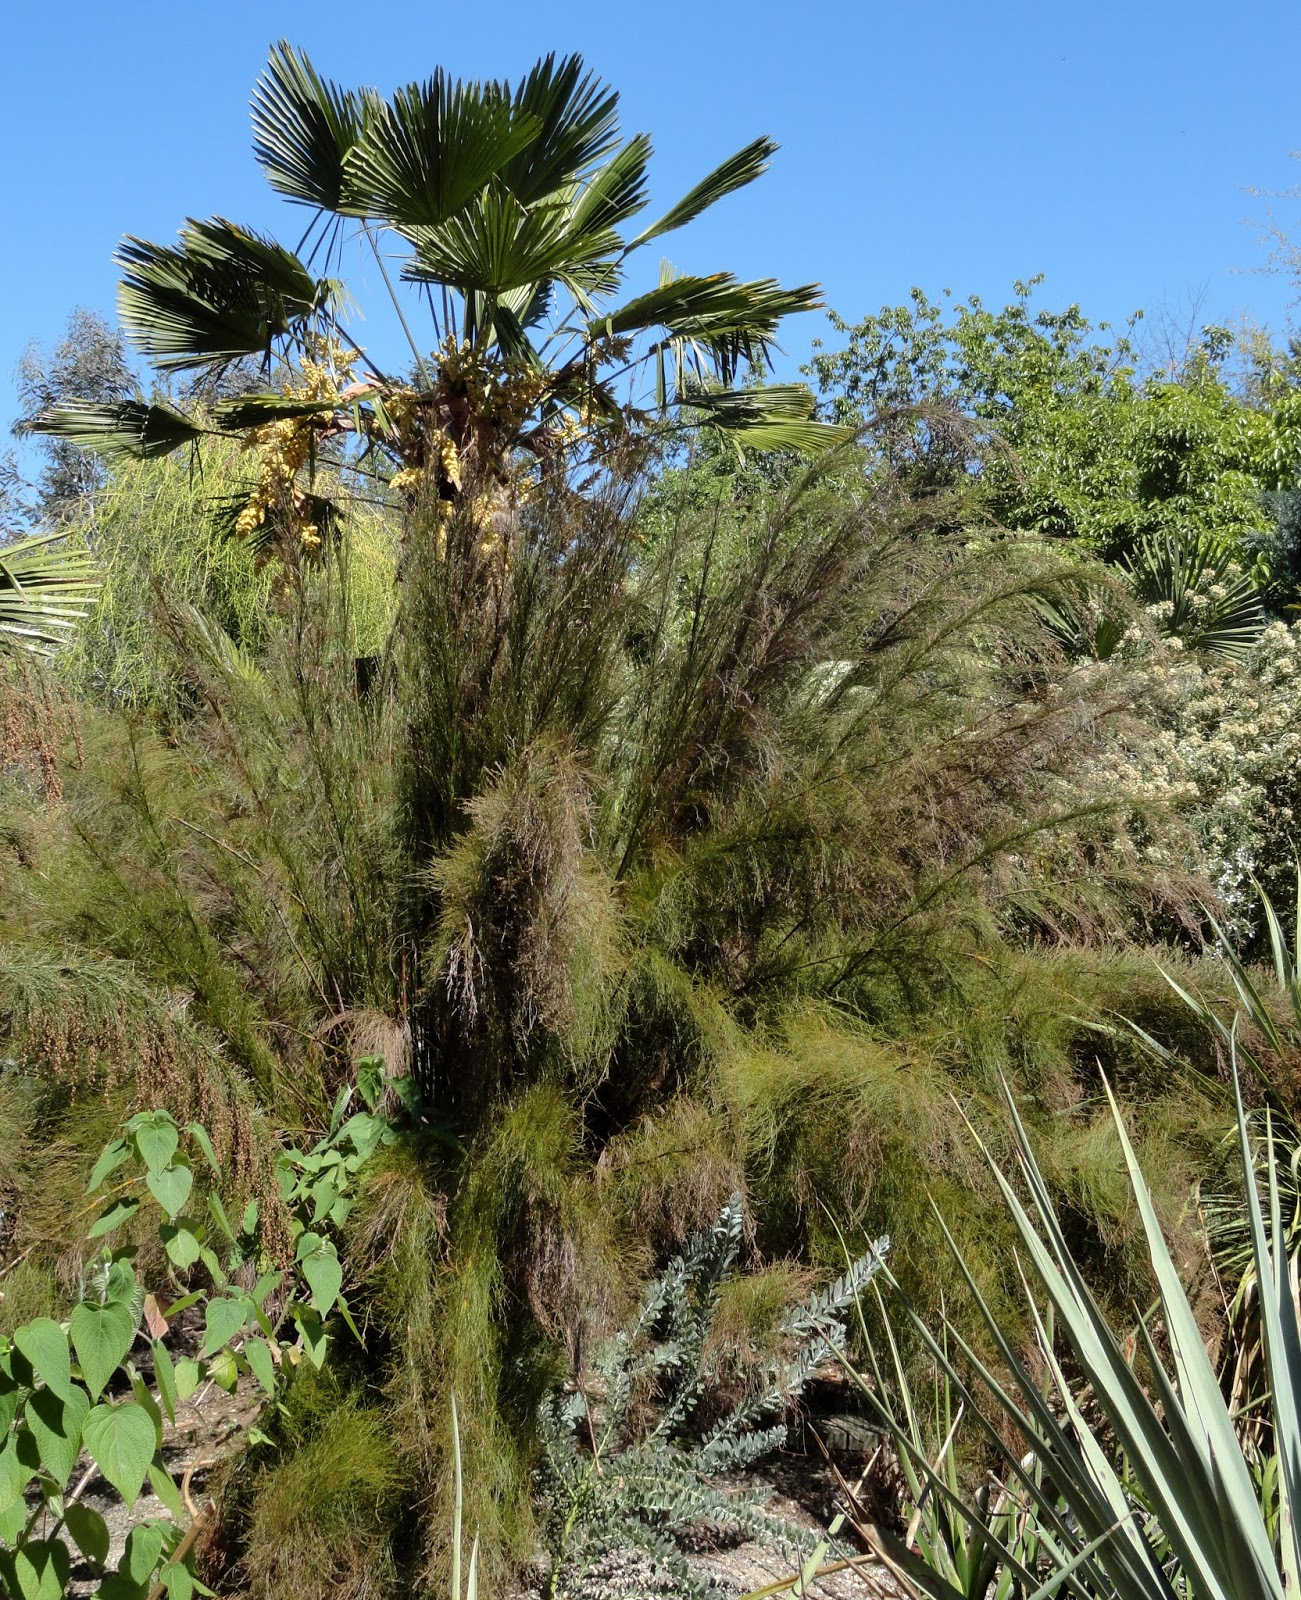 danger garden: The Kuzma Garden, a late May visit